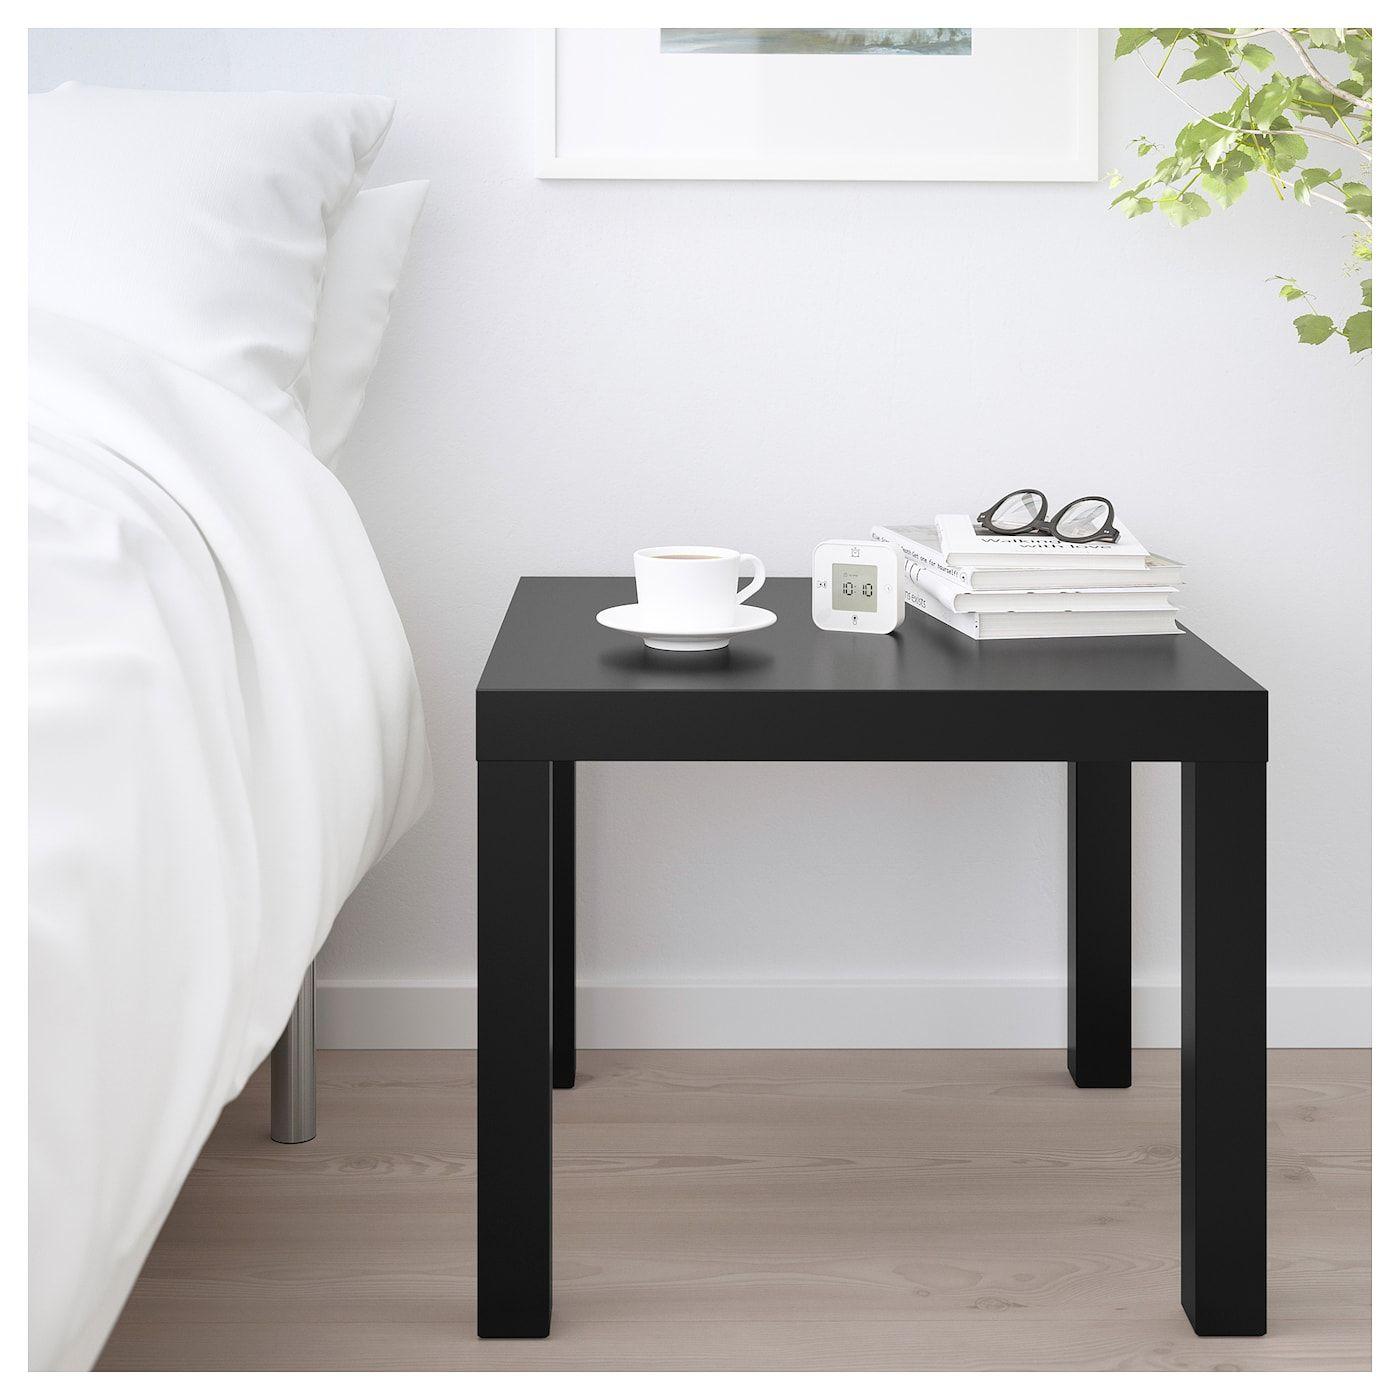 Ikea Lack Side Table, Black